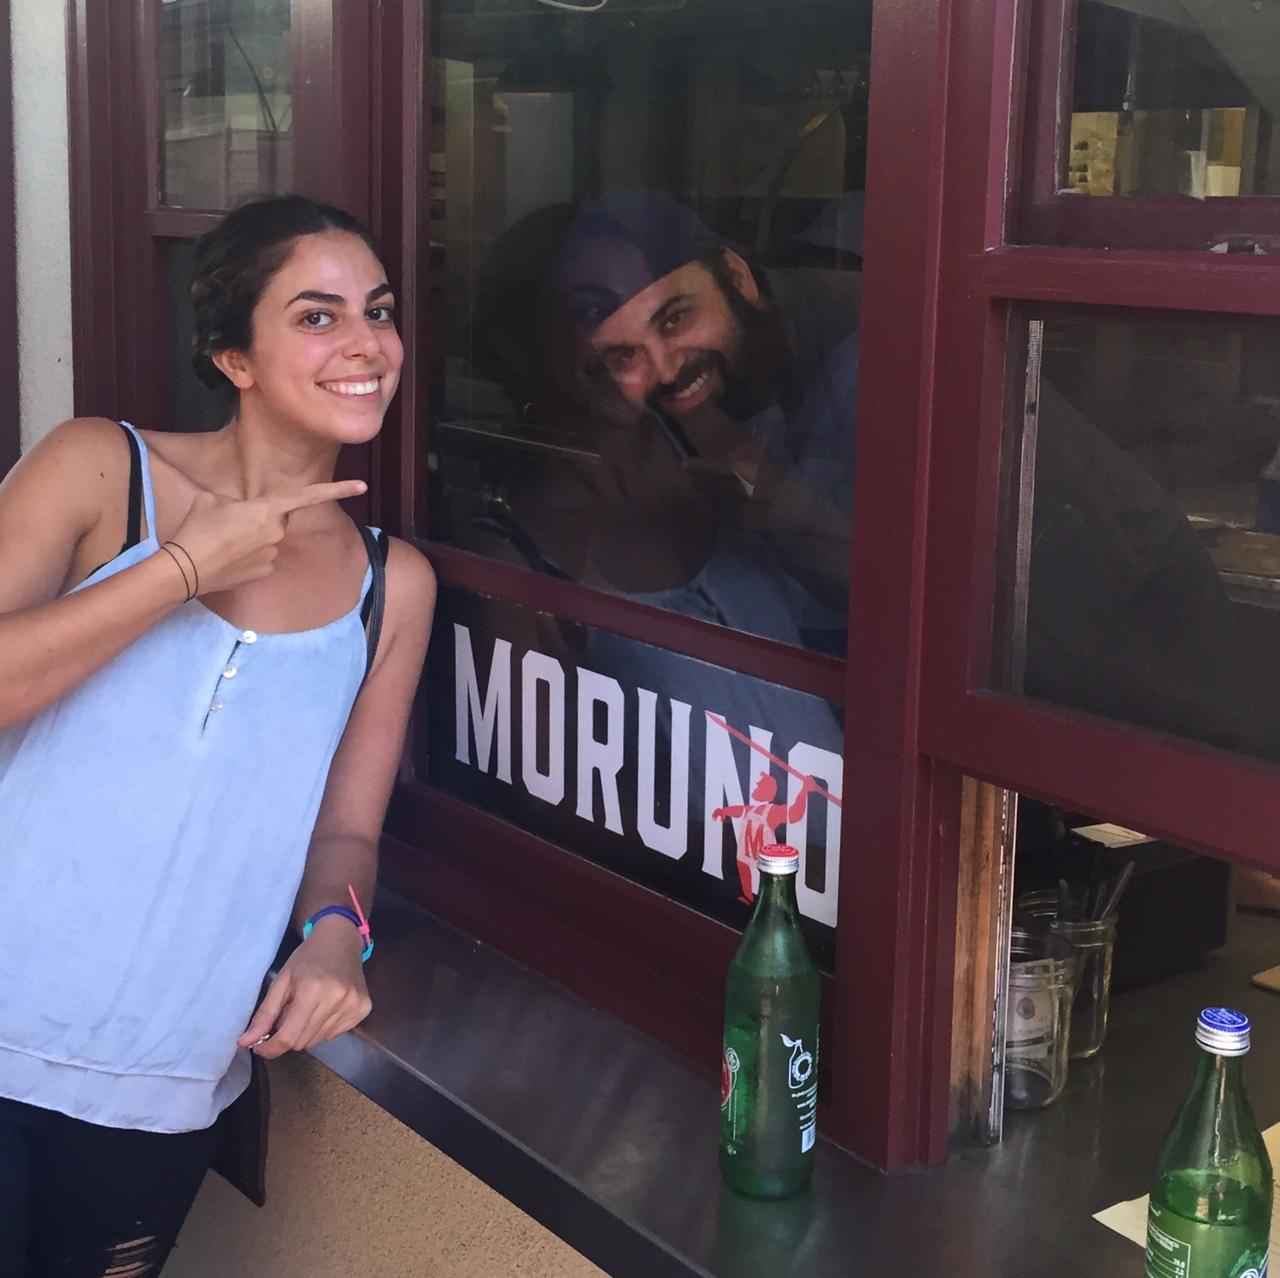 Deb michail A happy customer, points to moruno chef chris feldmeier